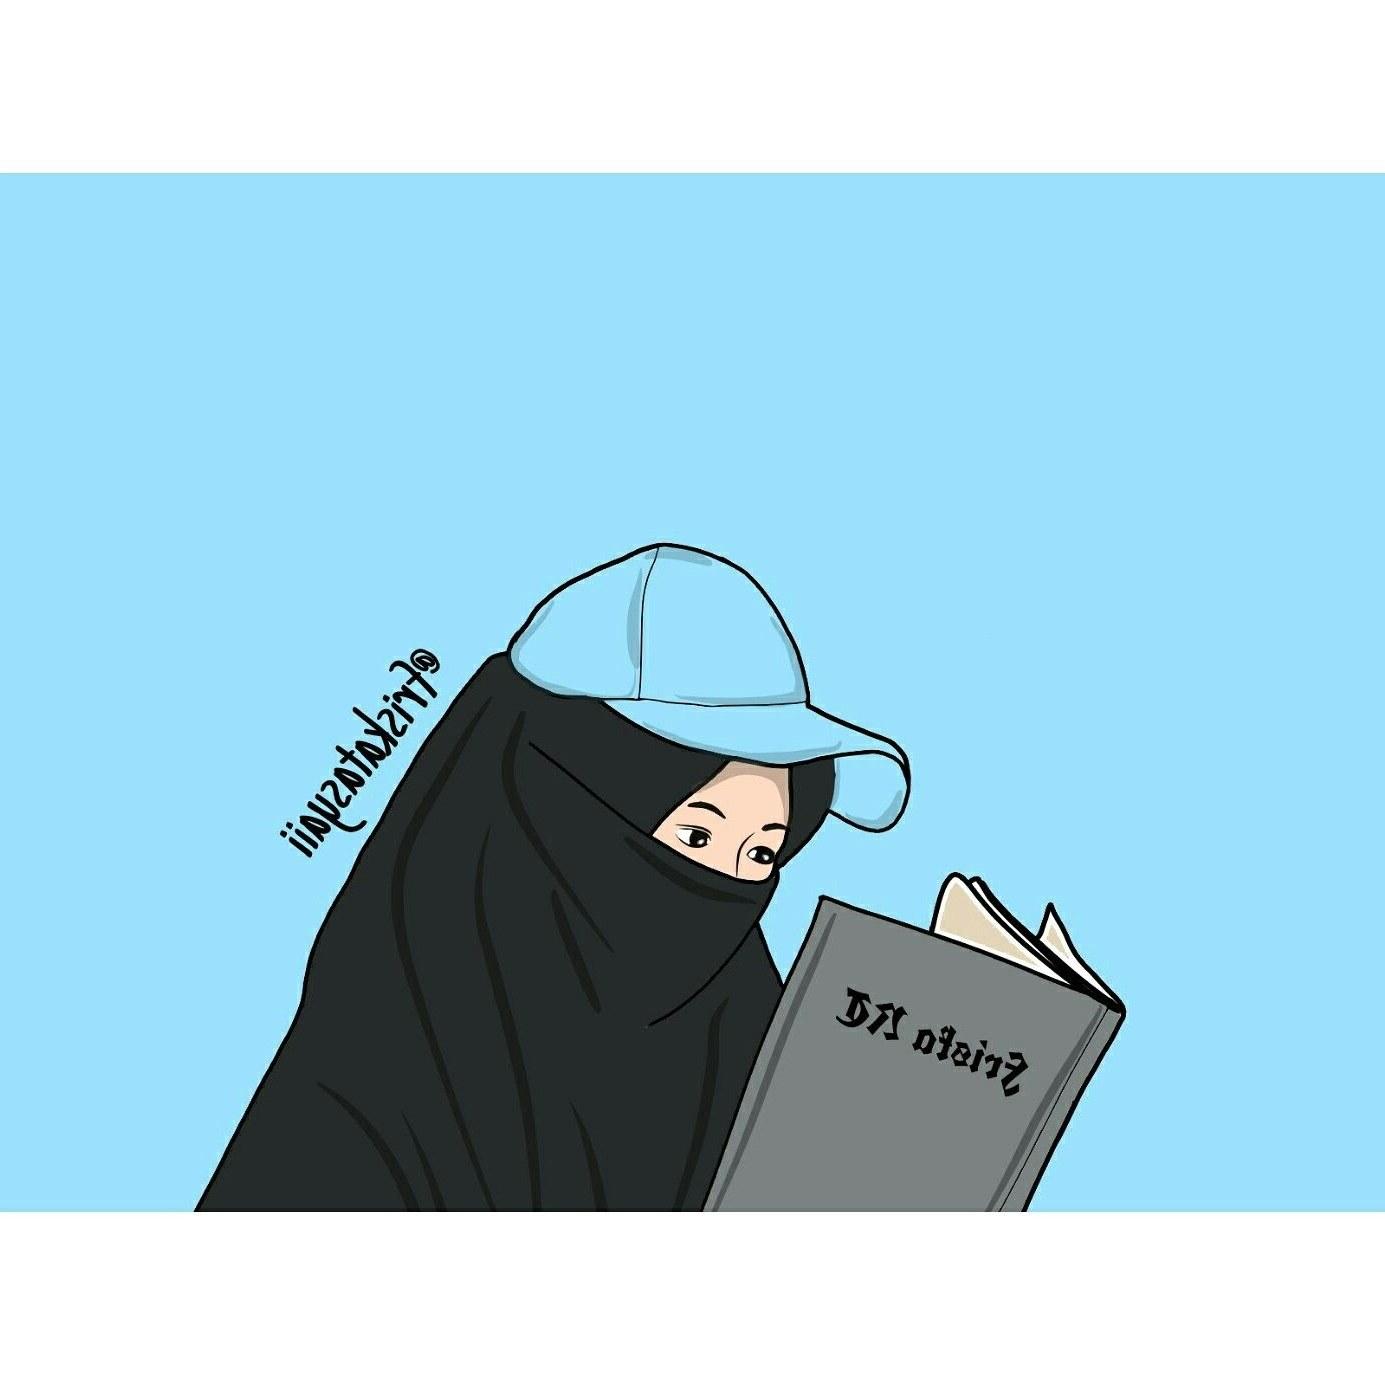 Ide Muslimah Kartun Keren H9d9 Gambar Kartun Muslimah Modern Cari Gambar Keren Hd